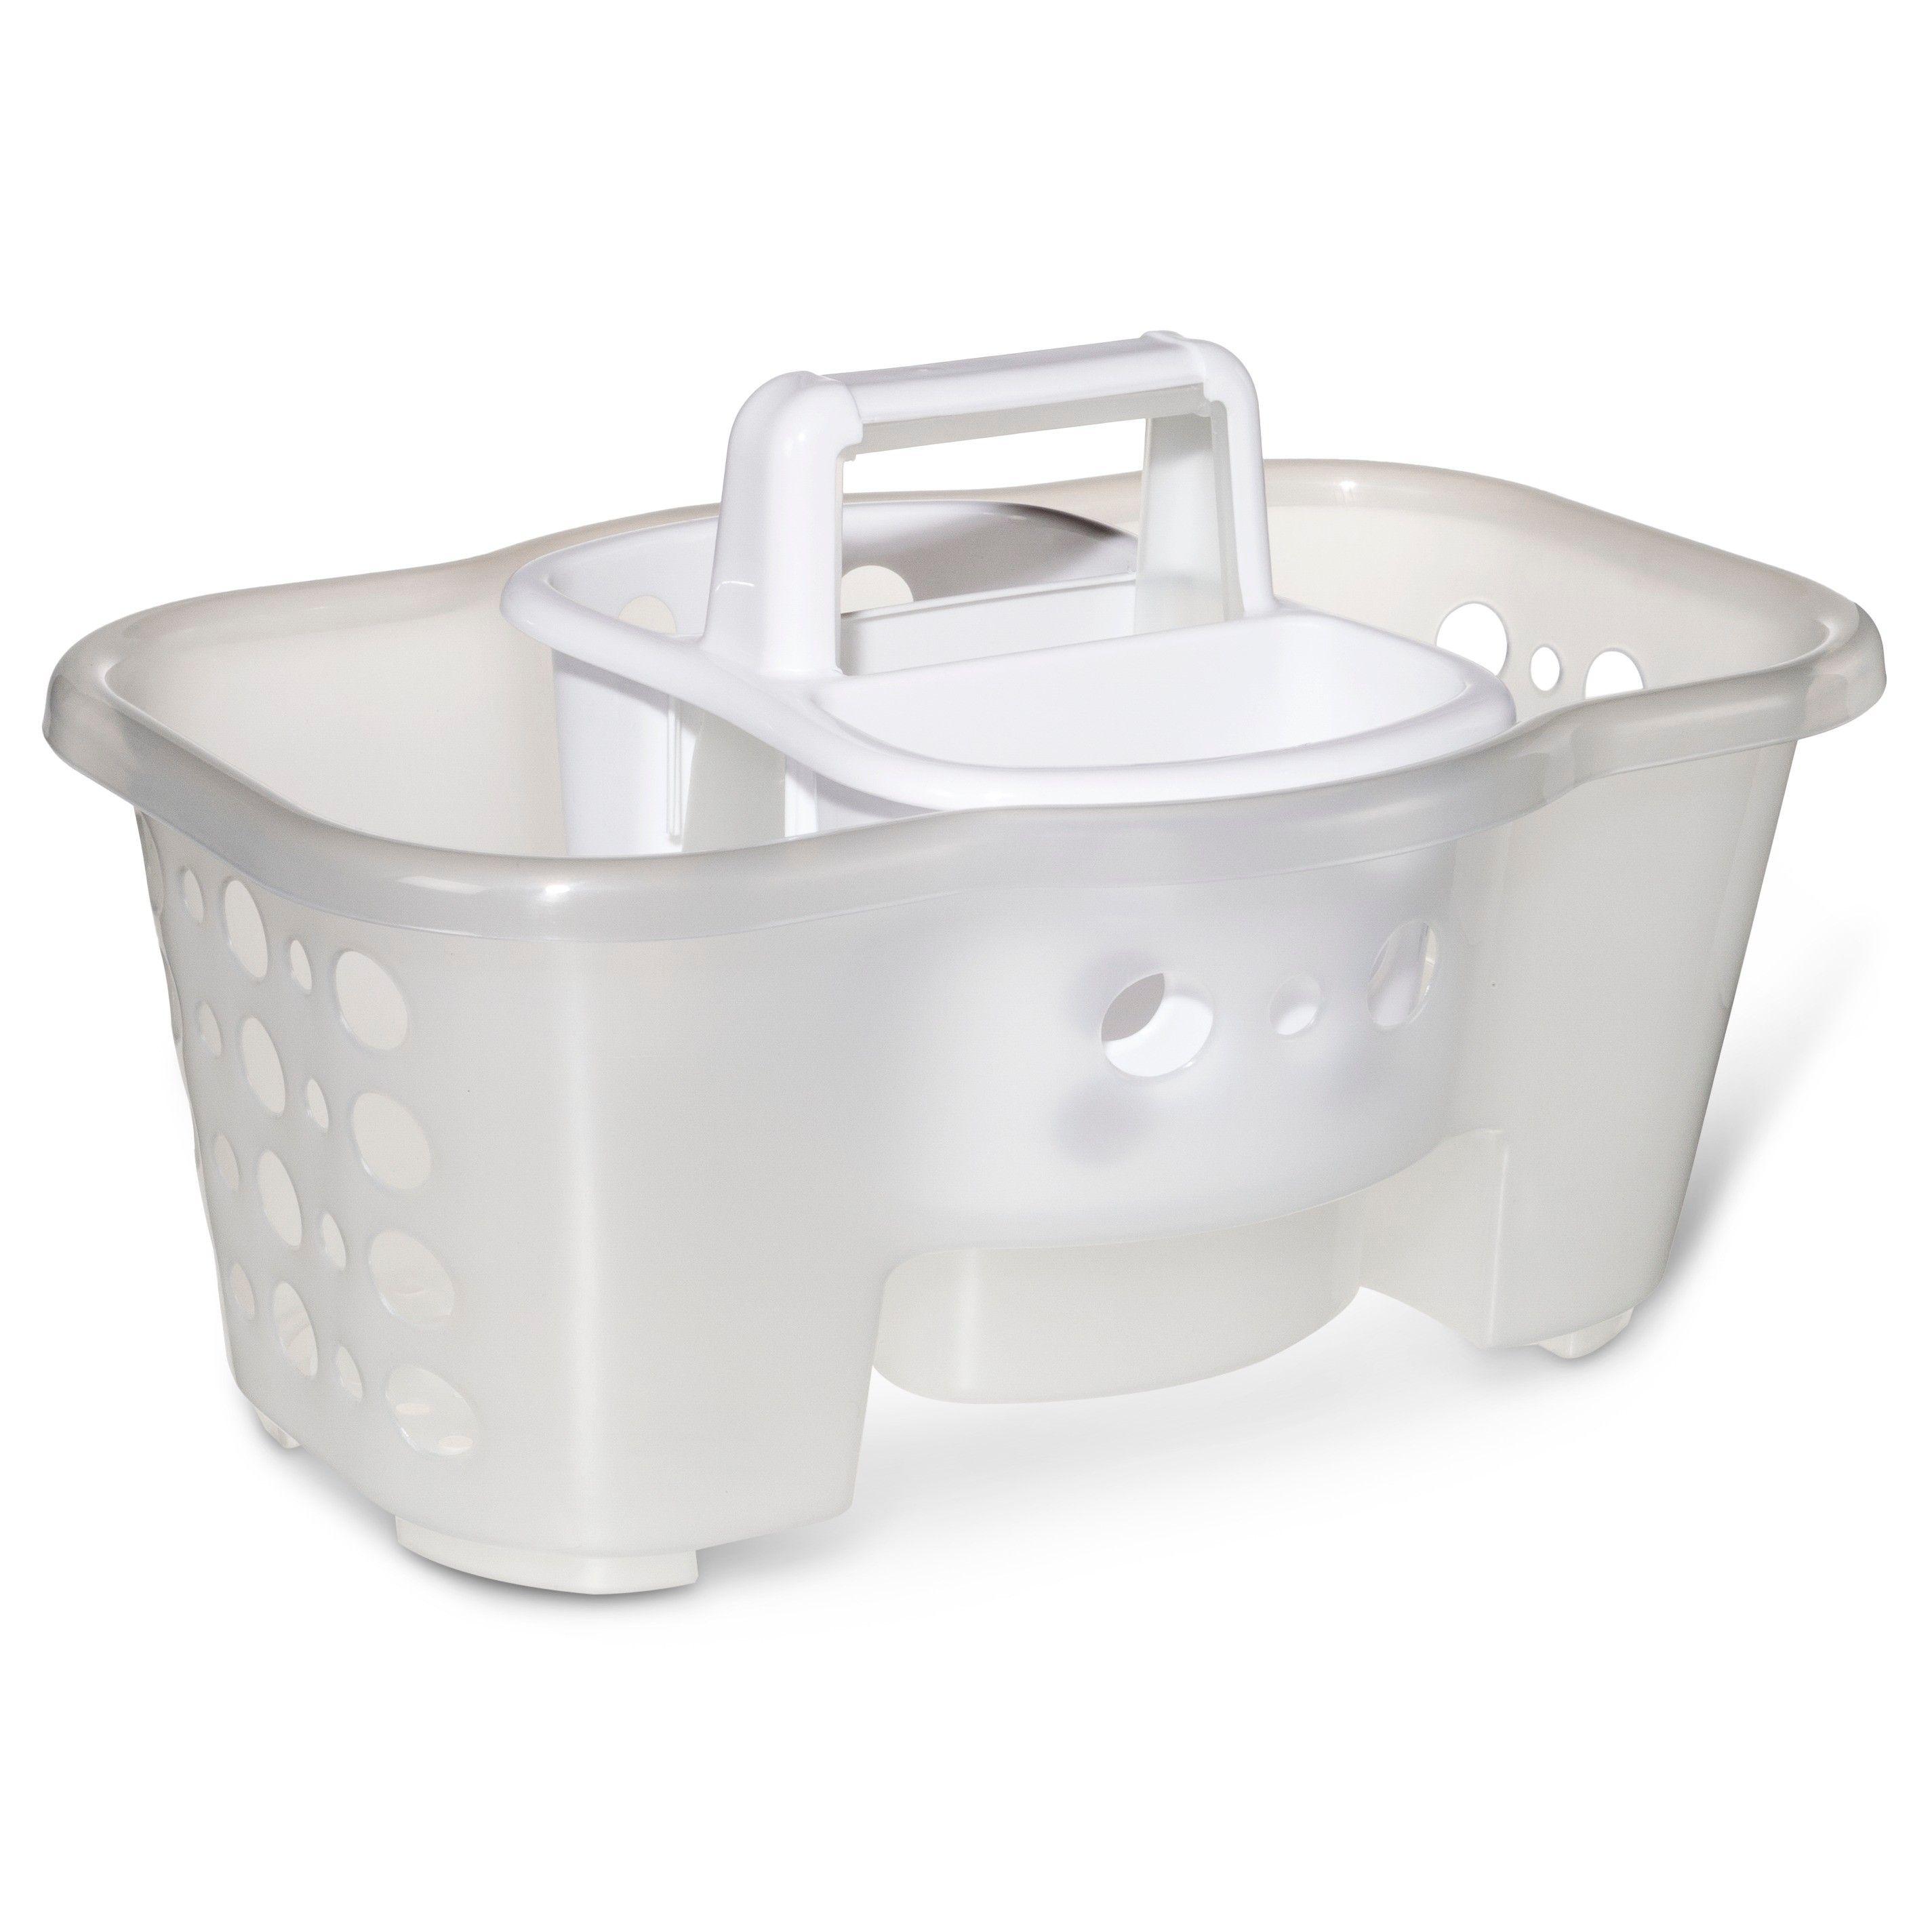 Room Essentials™ 2-in-1 Shower Caddy : Target - $8.99 ...